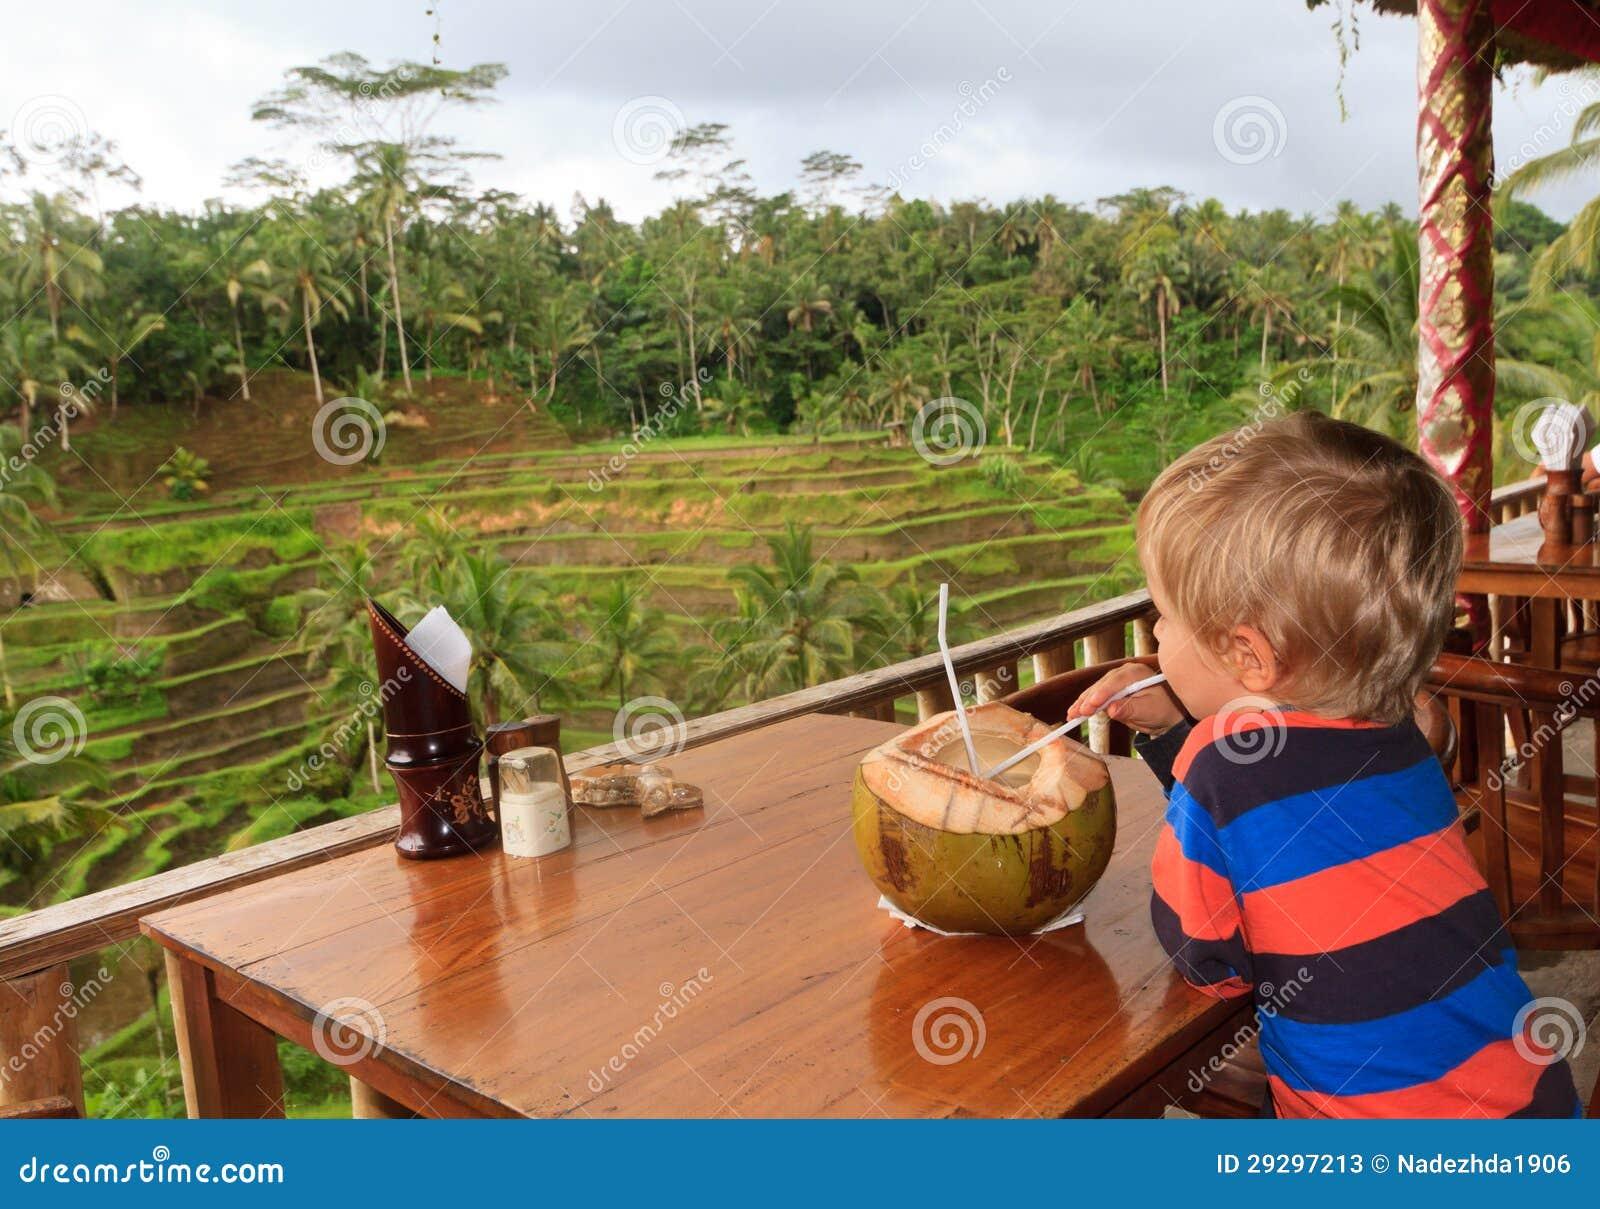 Little boy looking at rice fields